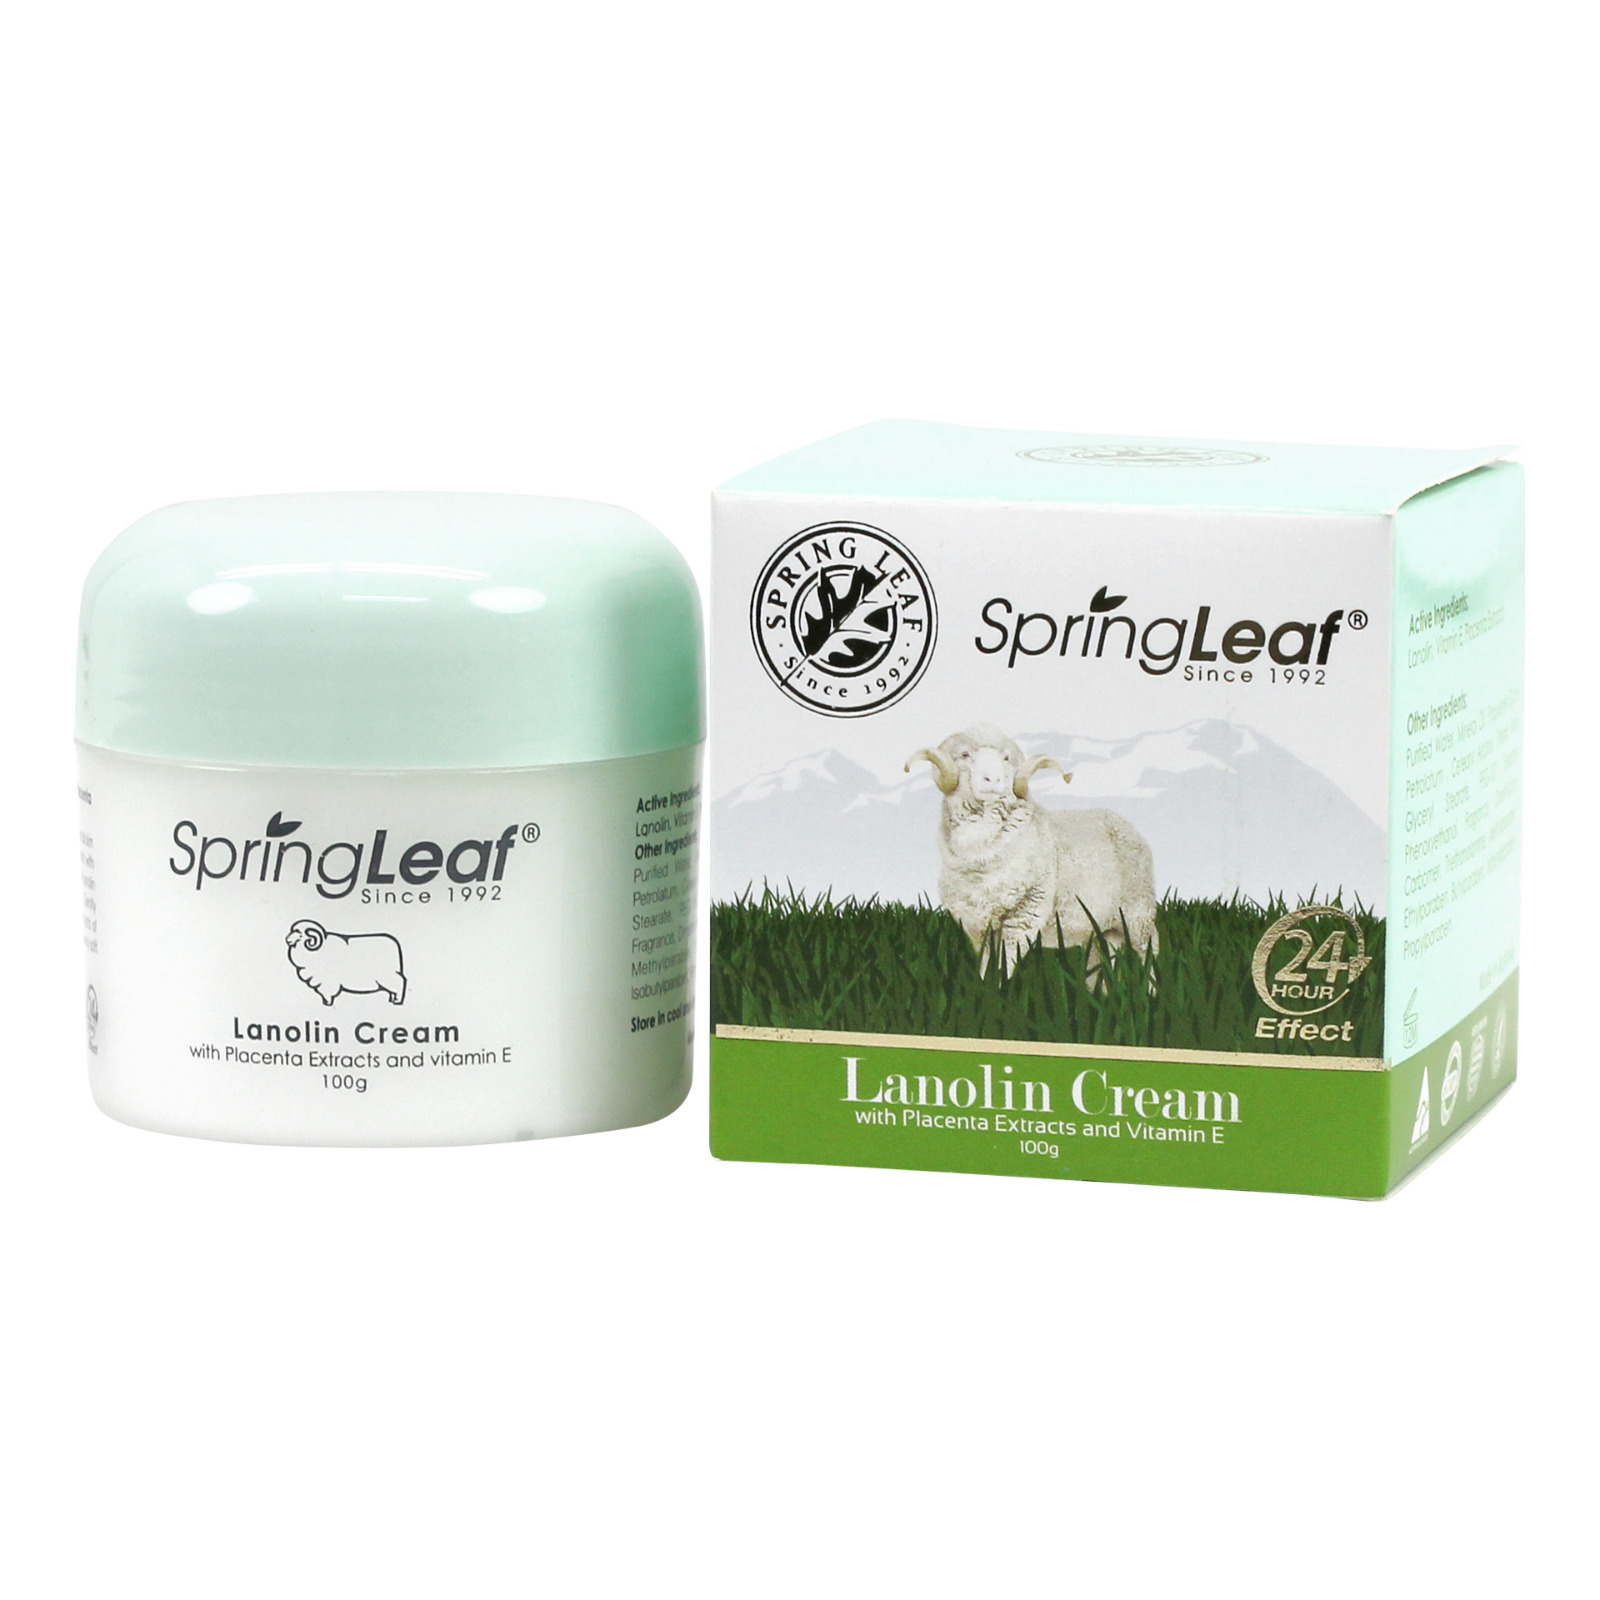 Springleaf lanolincream 0215  1